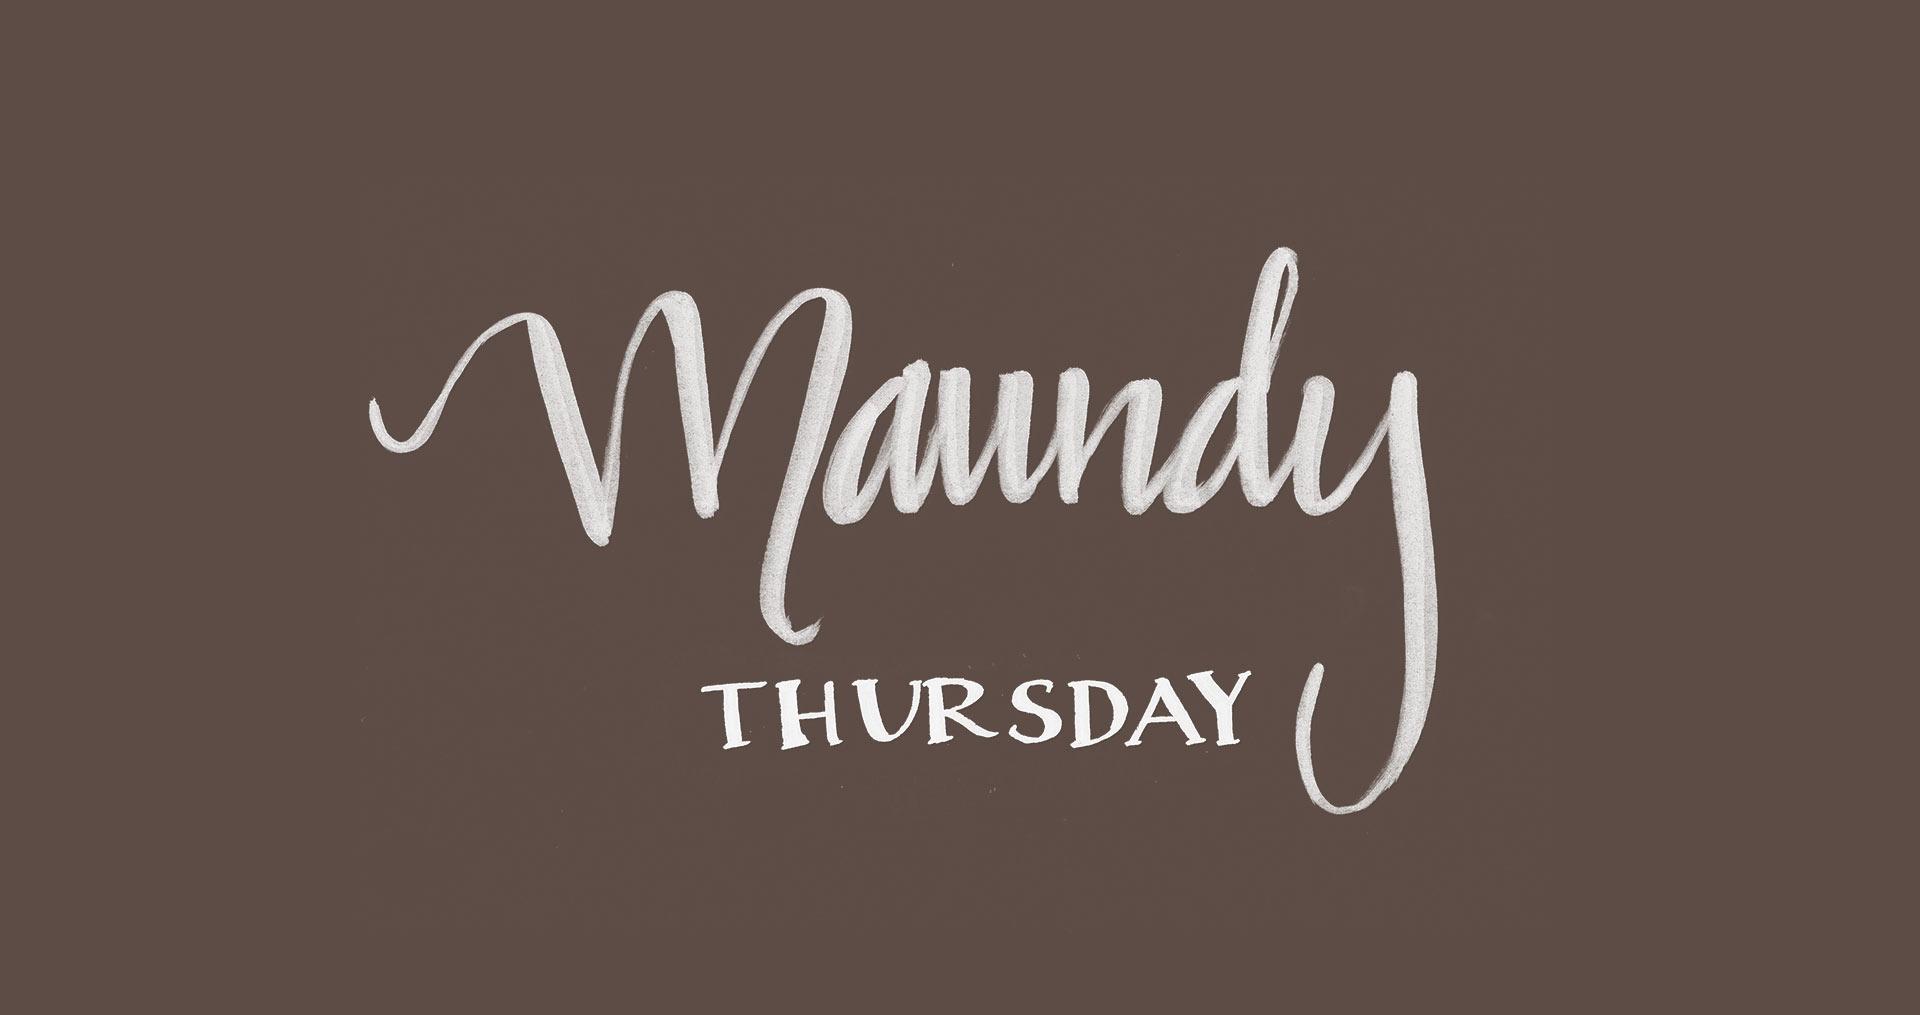 Maundy Thursday Images 01916